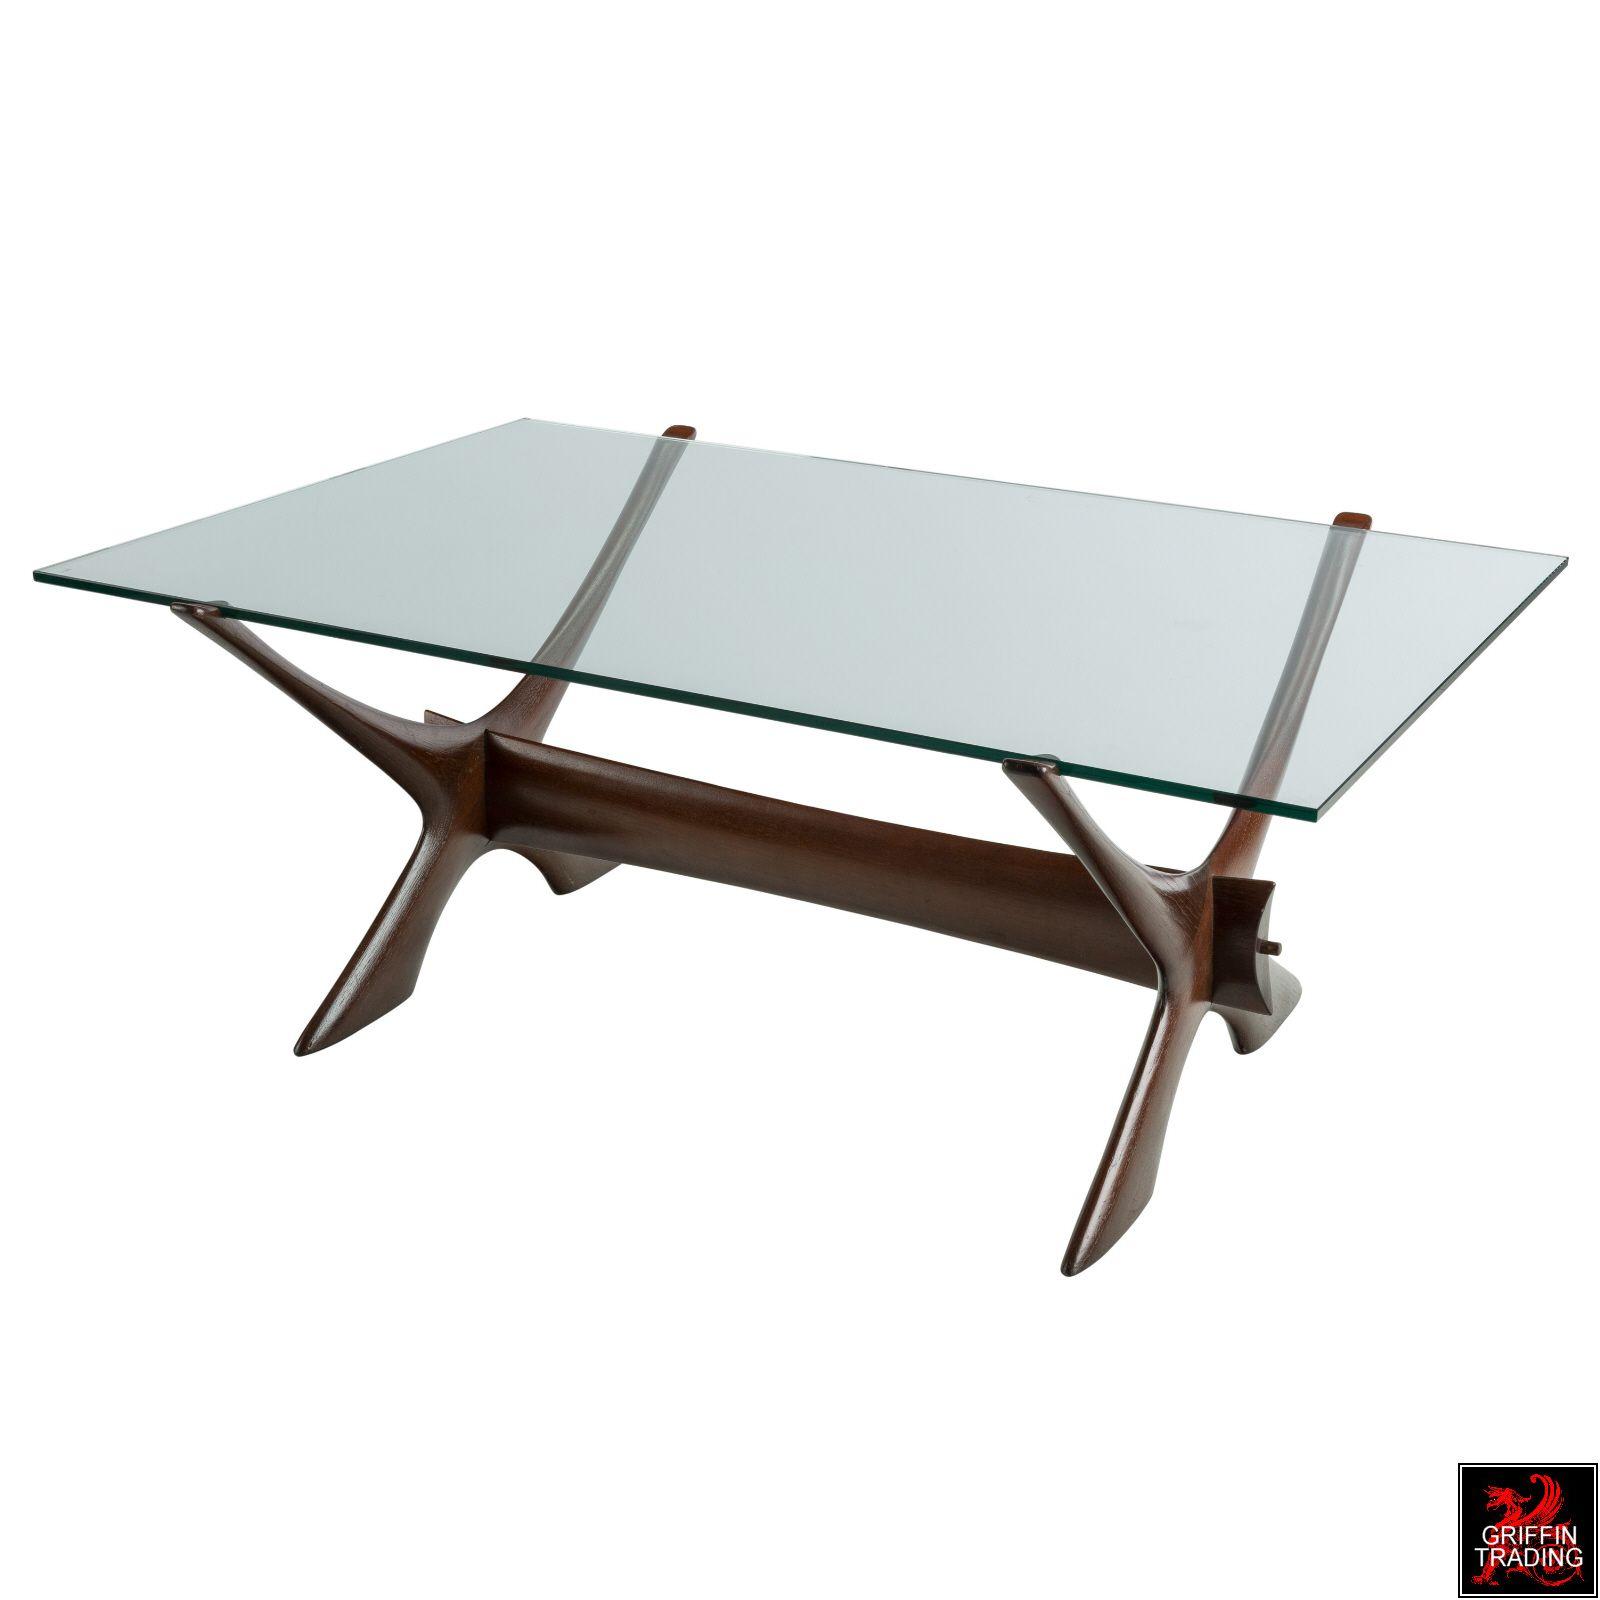 Scandinavian Coffee Table By Fredrik Schriever Abeln Coffee Tables For Sale Scandinavian Coffee Table Table